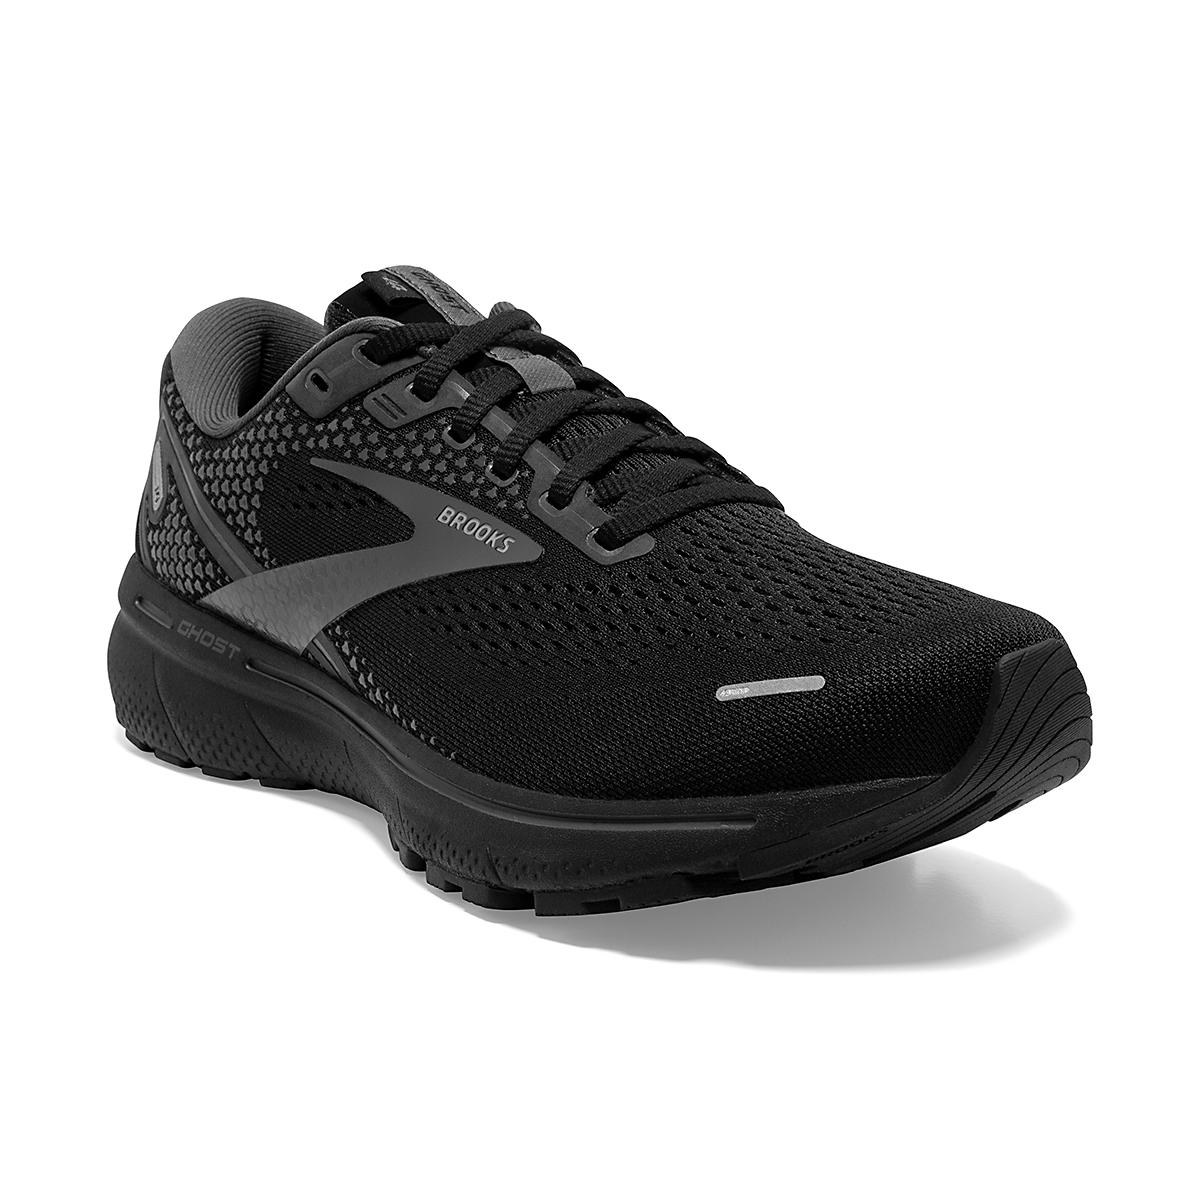 Women's Brooks Ghost 14 Running Shoe - Color: Black/Black/Ebony - Size: 5 - Width: Regular, Black/Black/Ebony, large, image 5